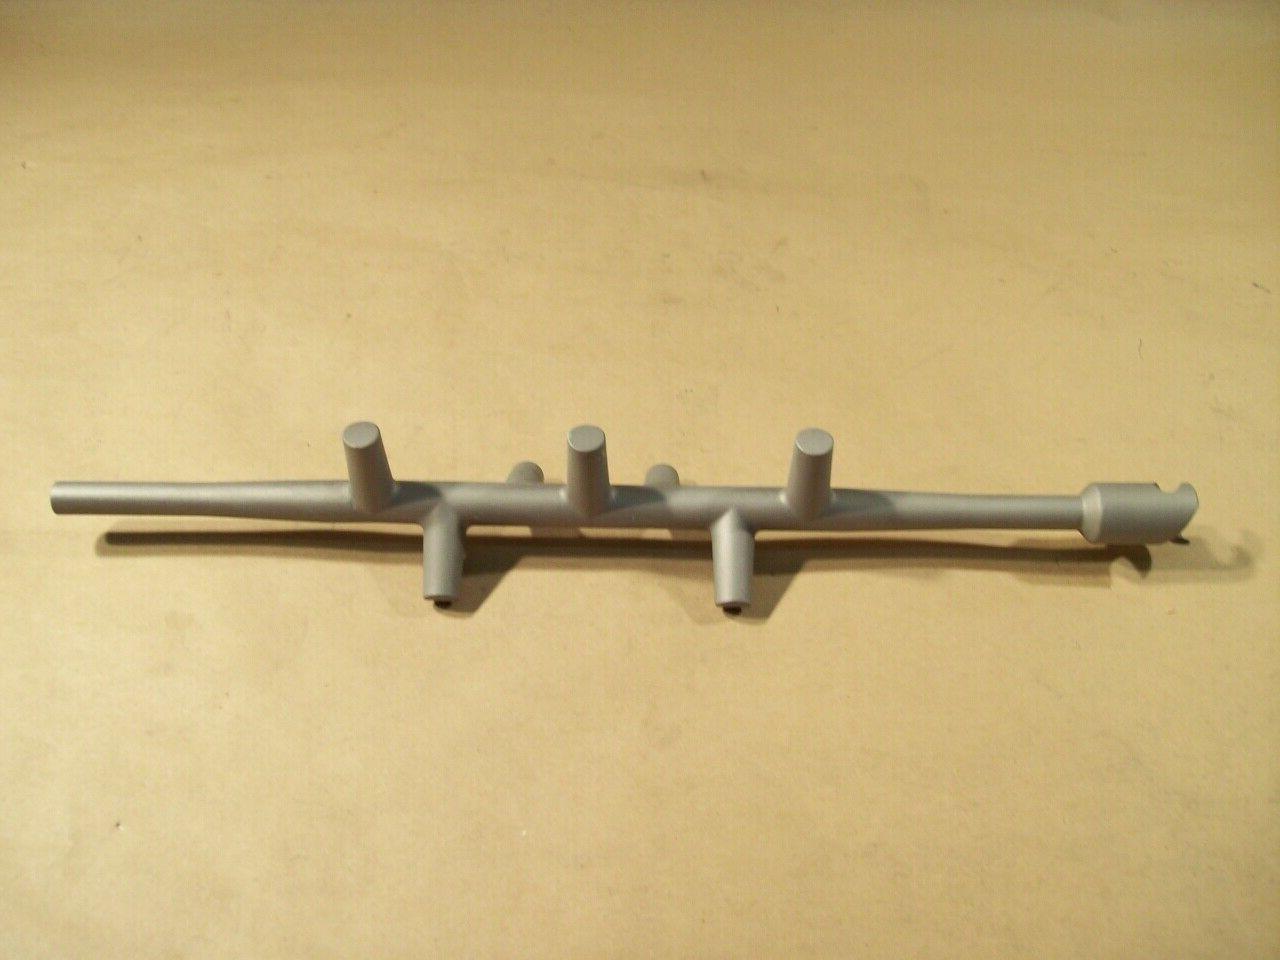 50 1697 m55 pellet stove agitator w